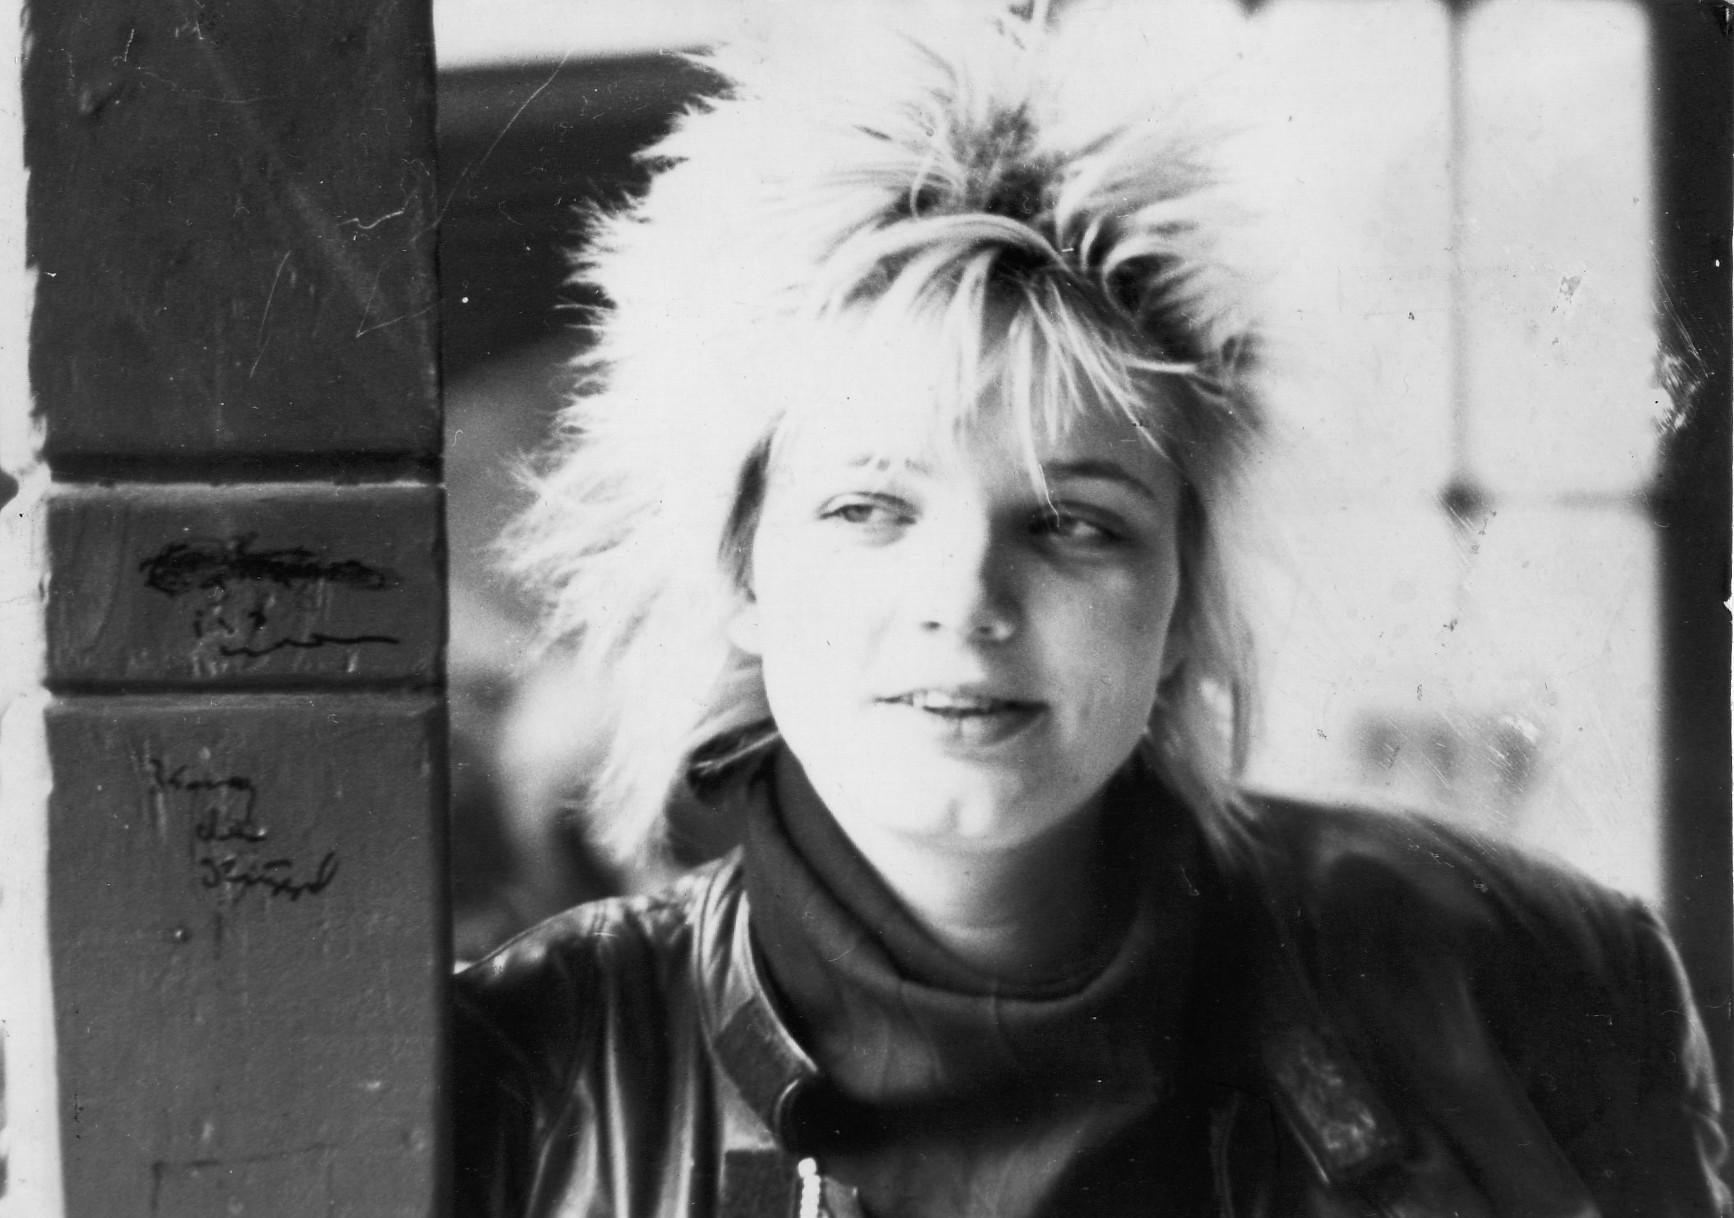 Frauen im Musikbusiness - Punk-Autorin Ute Wieners 1